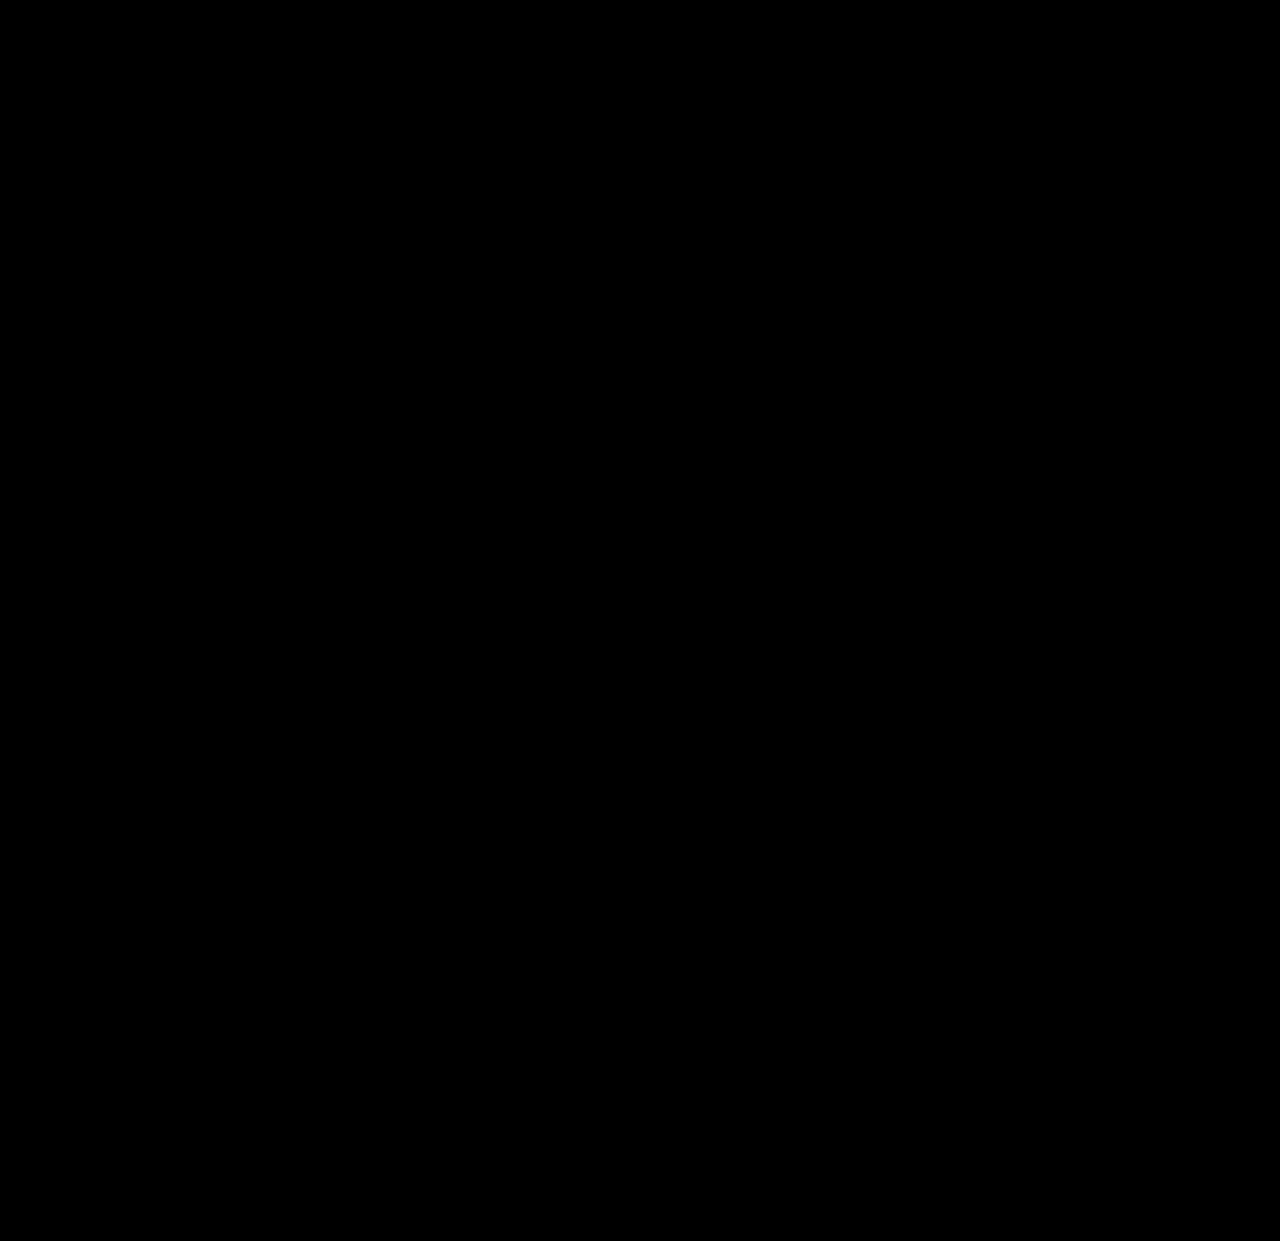 Лисичка раскраска гриб